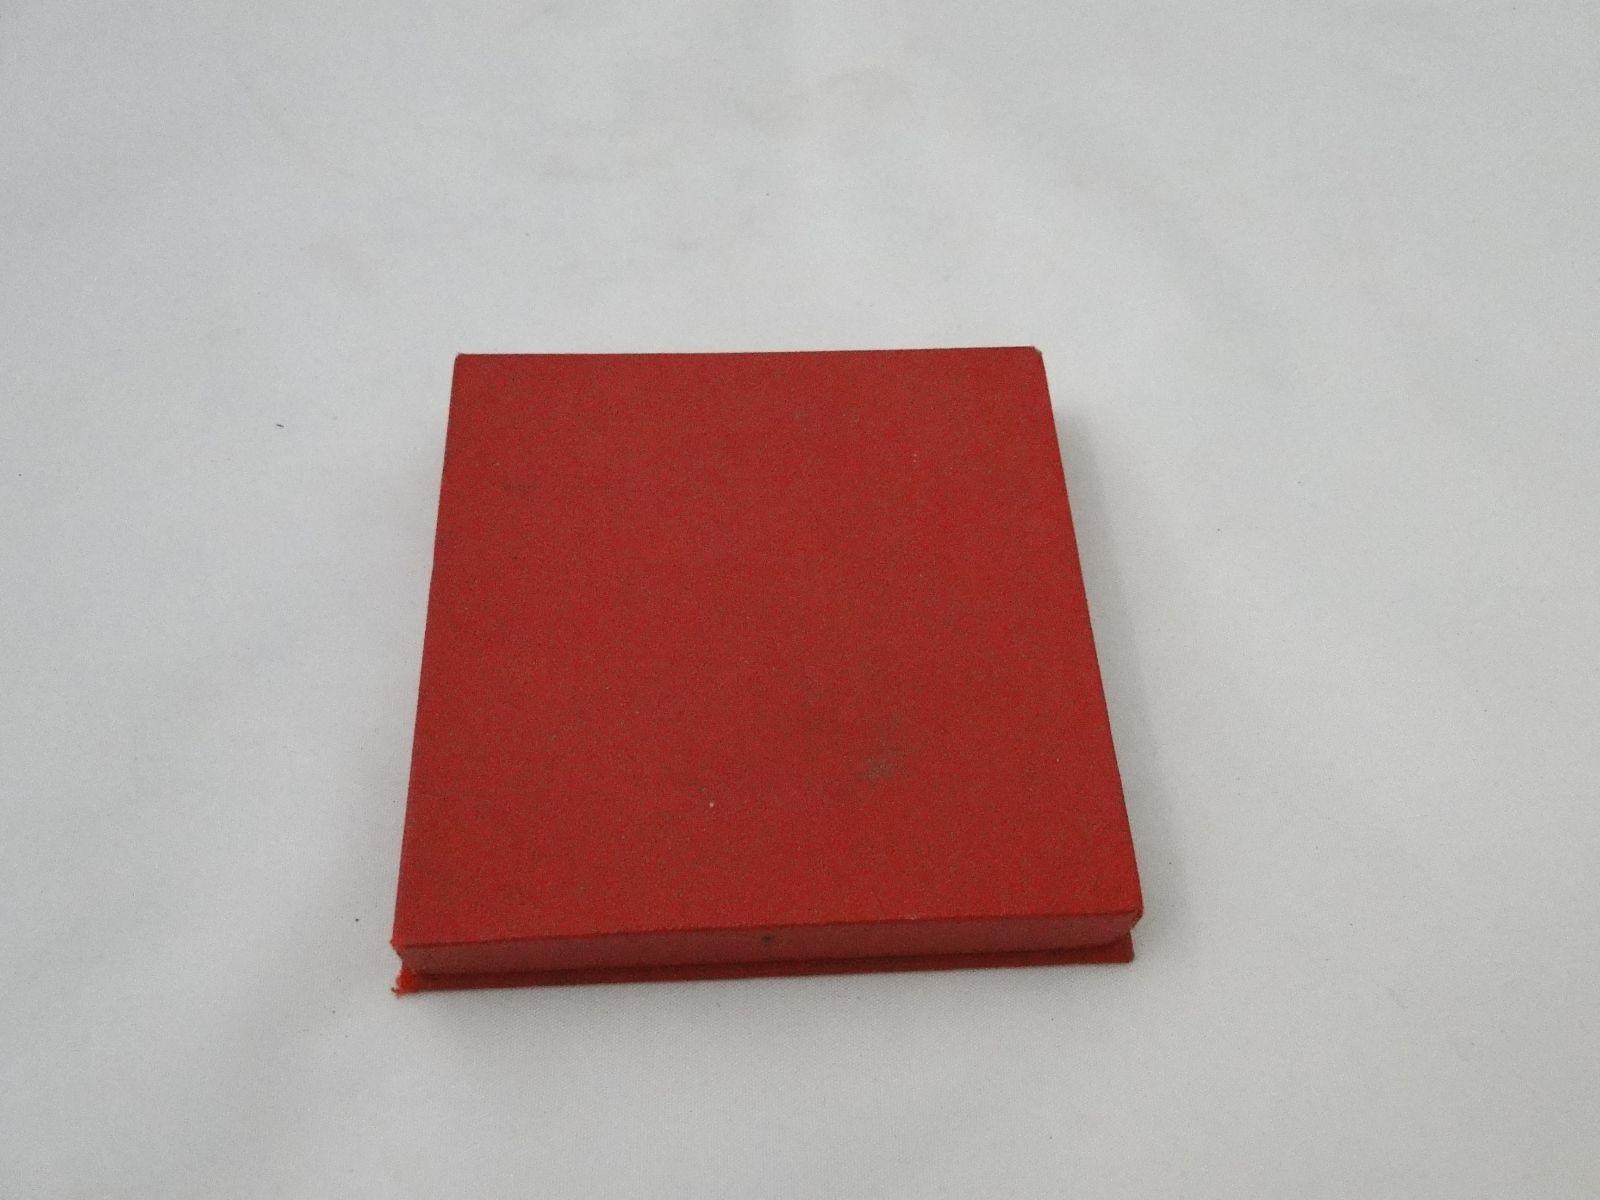 DSC08119.JPG (1600×1200)